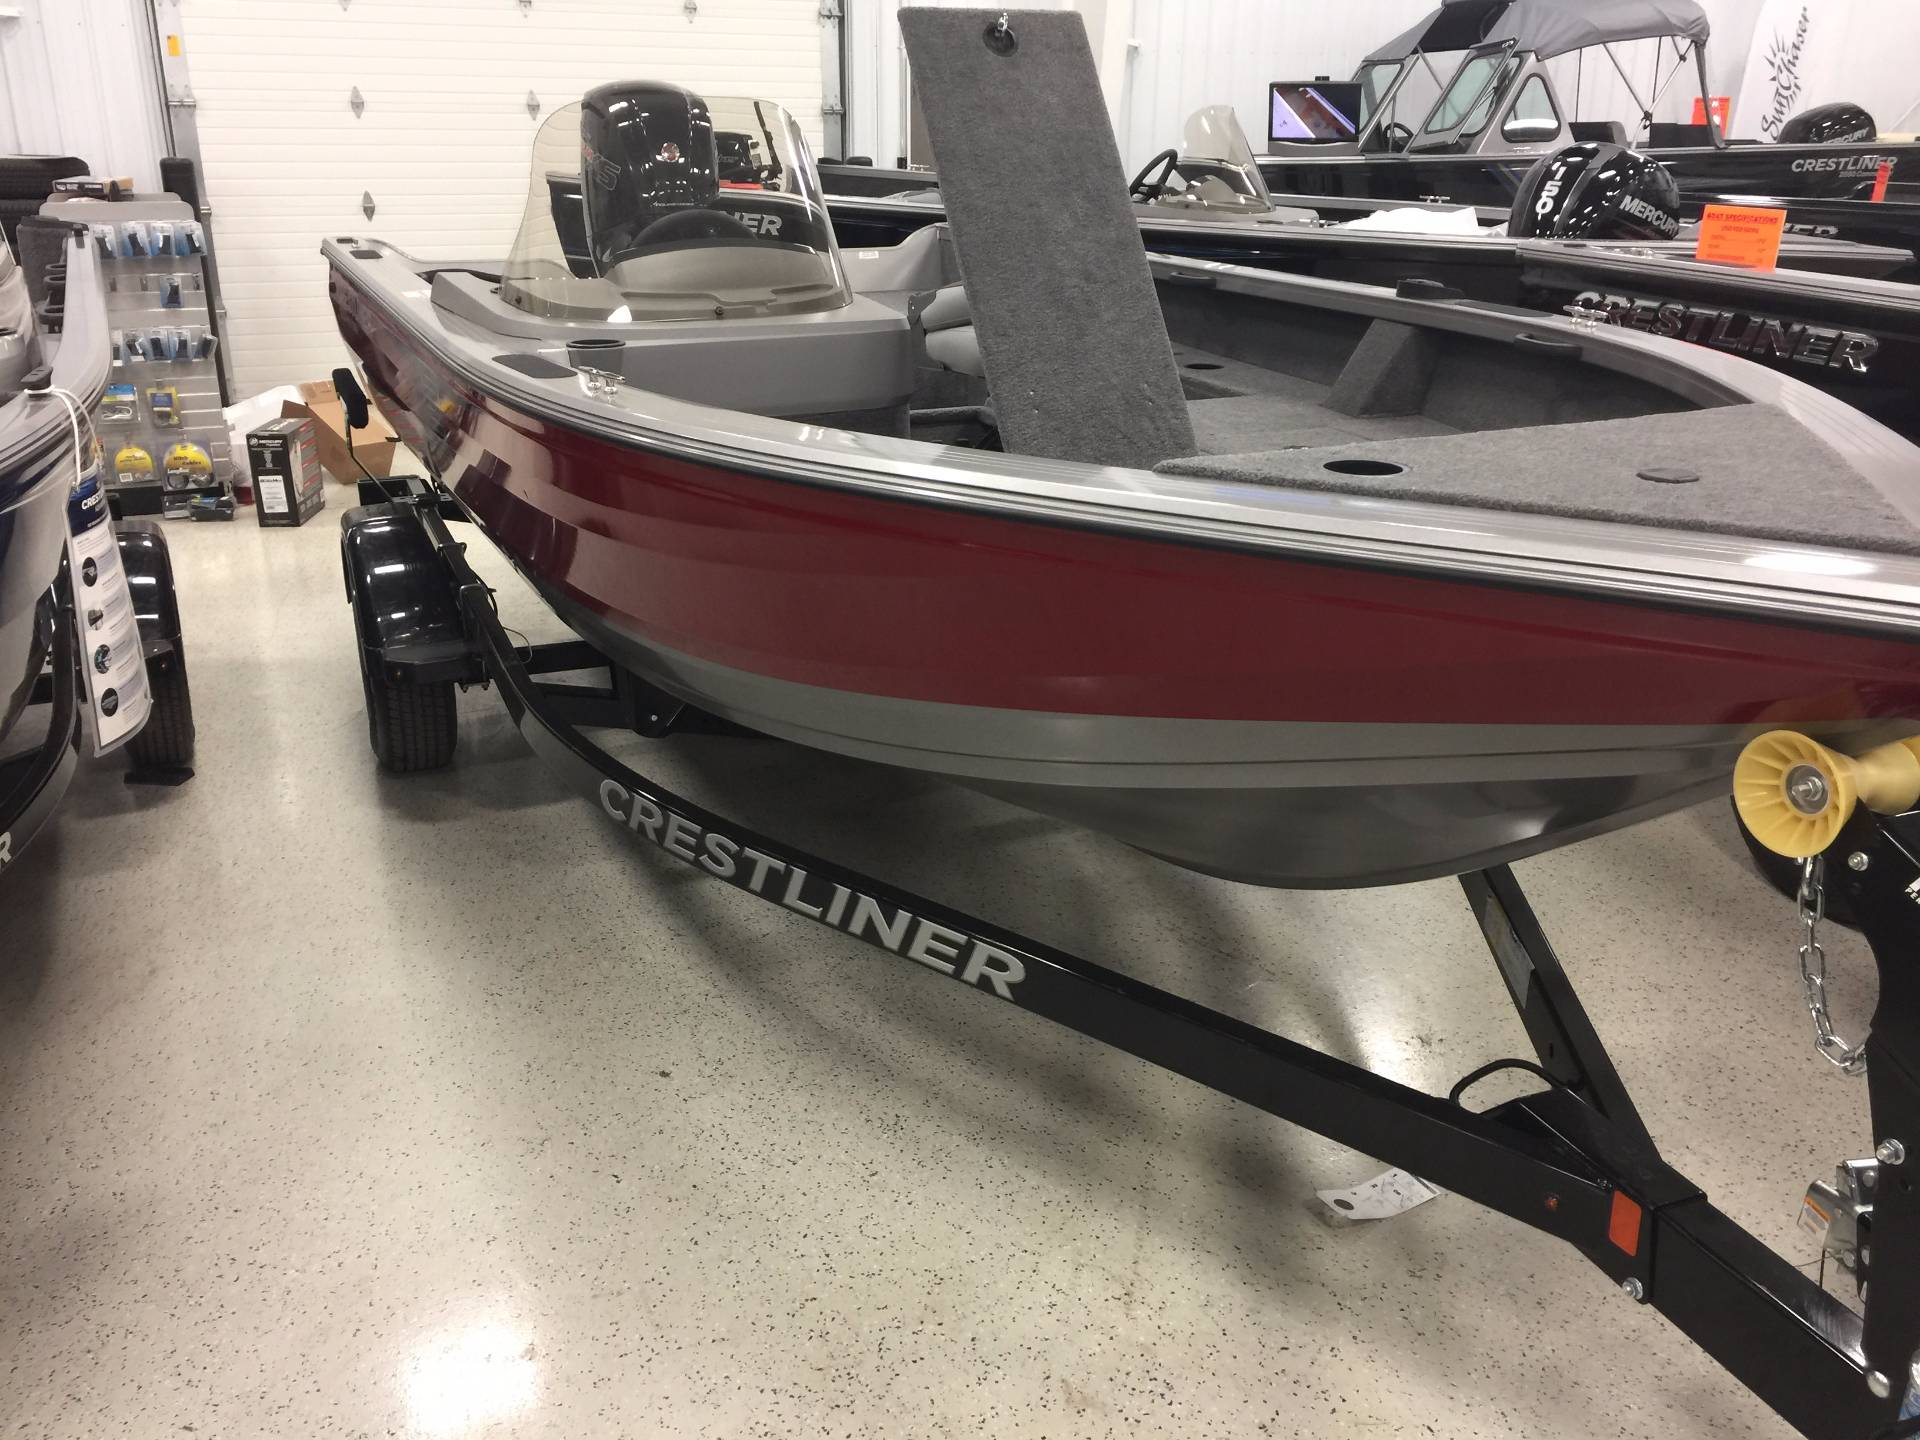 Crestliner 1750 fish hawk boats for sale page 8 of 18 for Crestliner fish hawk